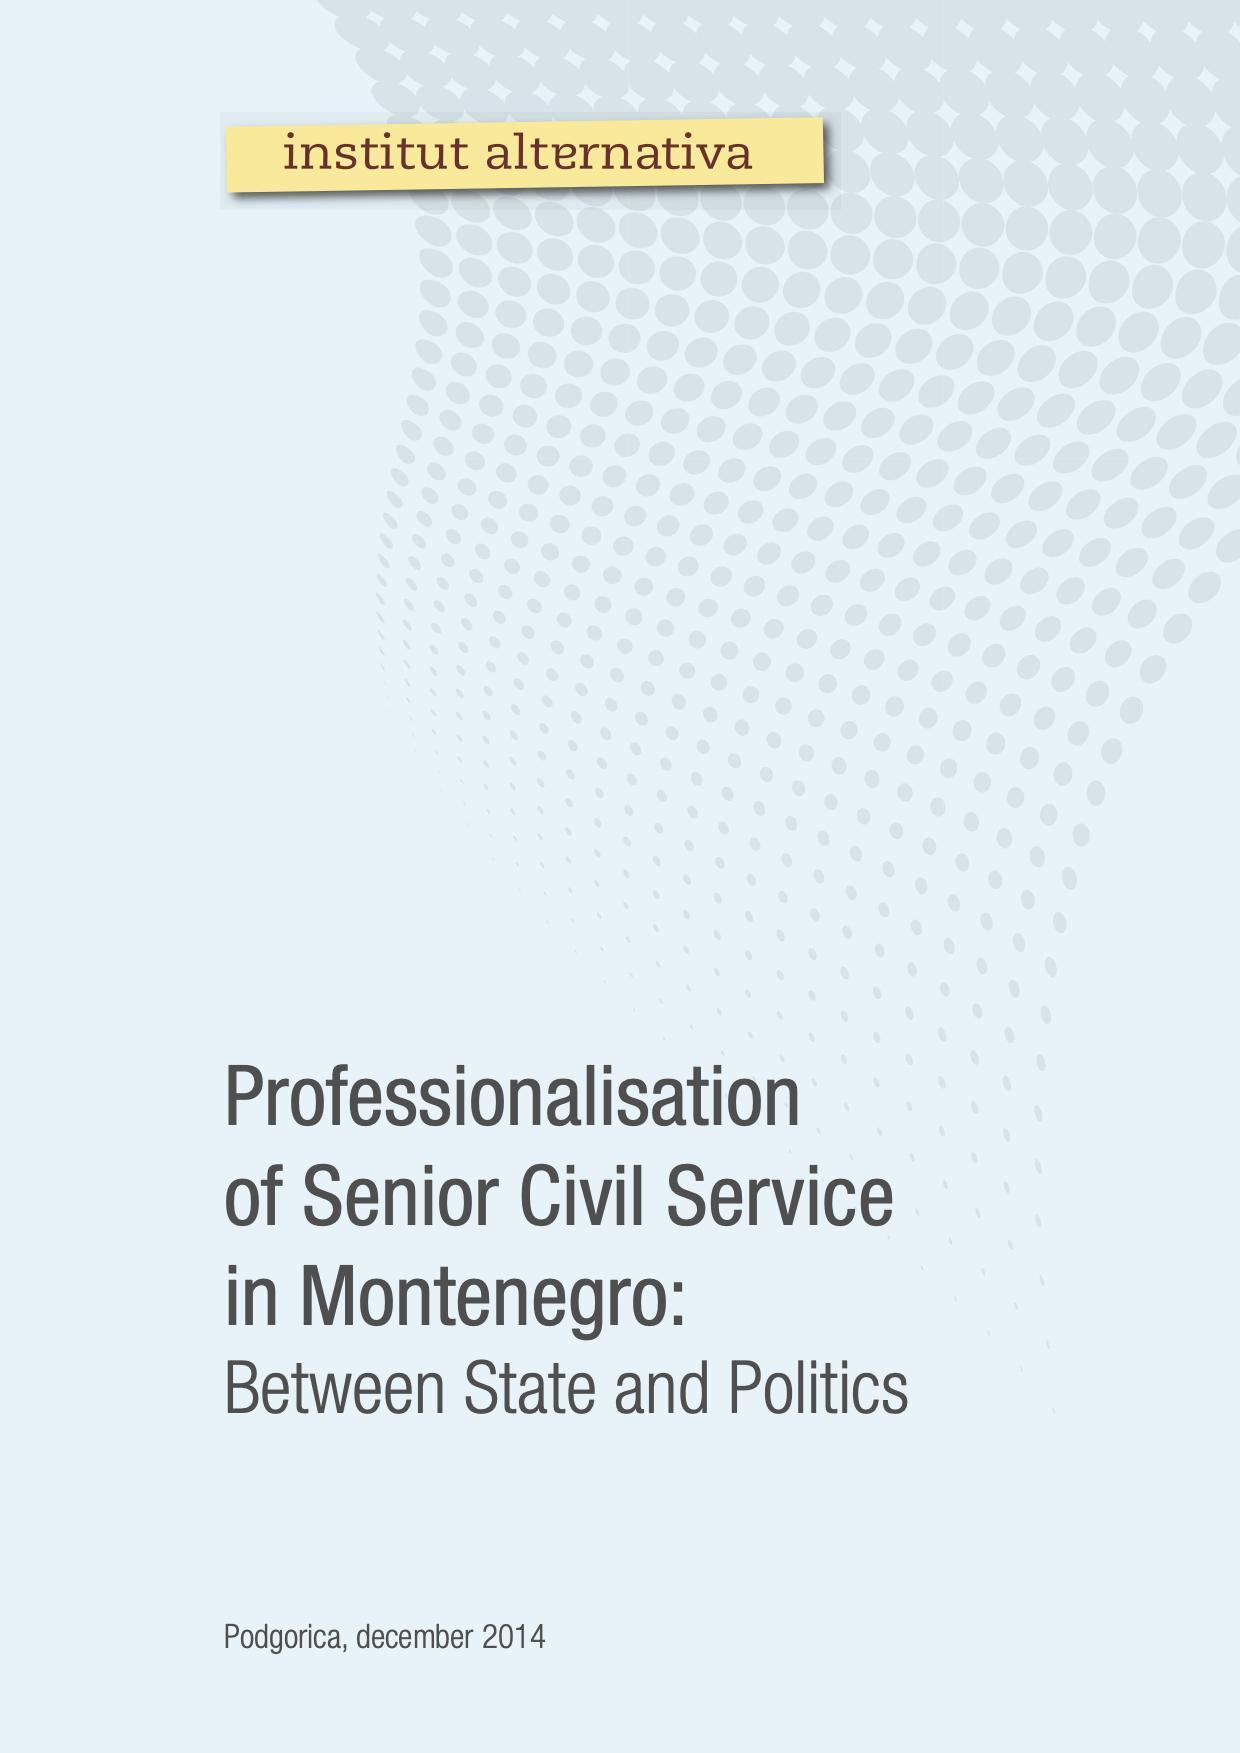 Professionalisation of Senior Civil Service in Montenegro: Between State and Politics